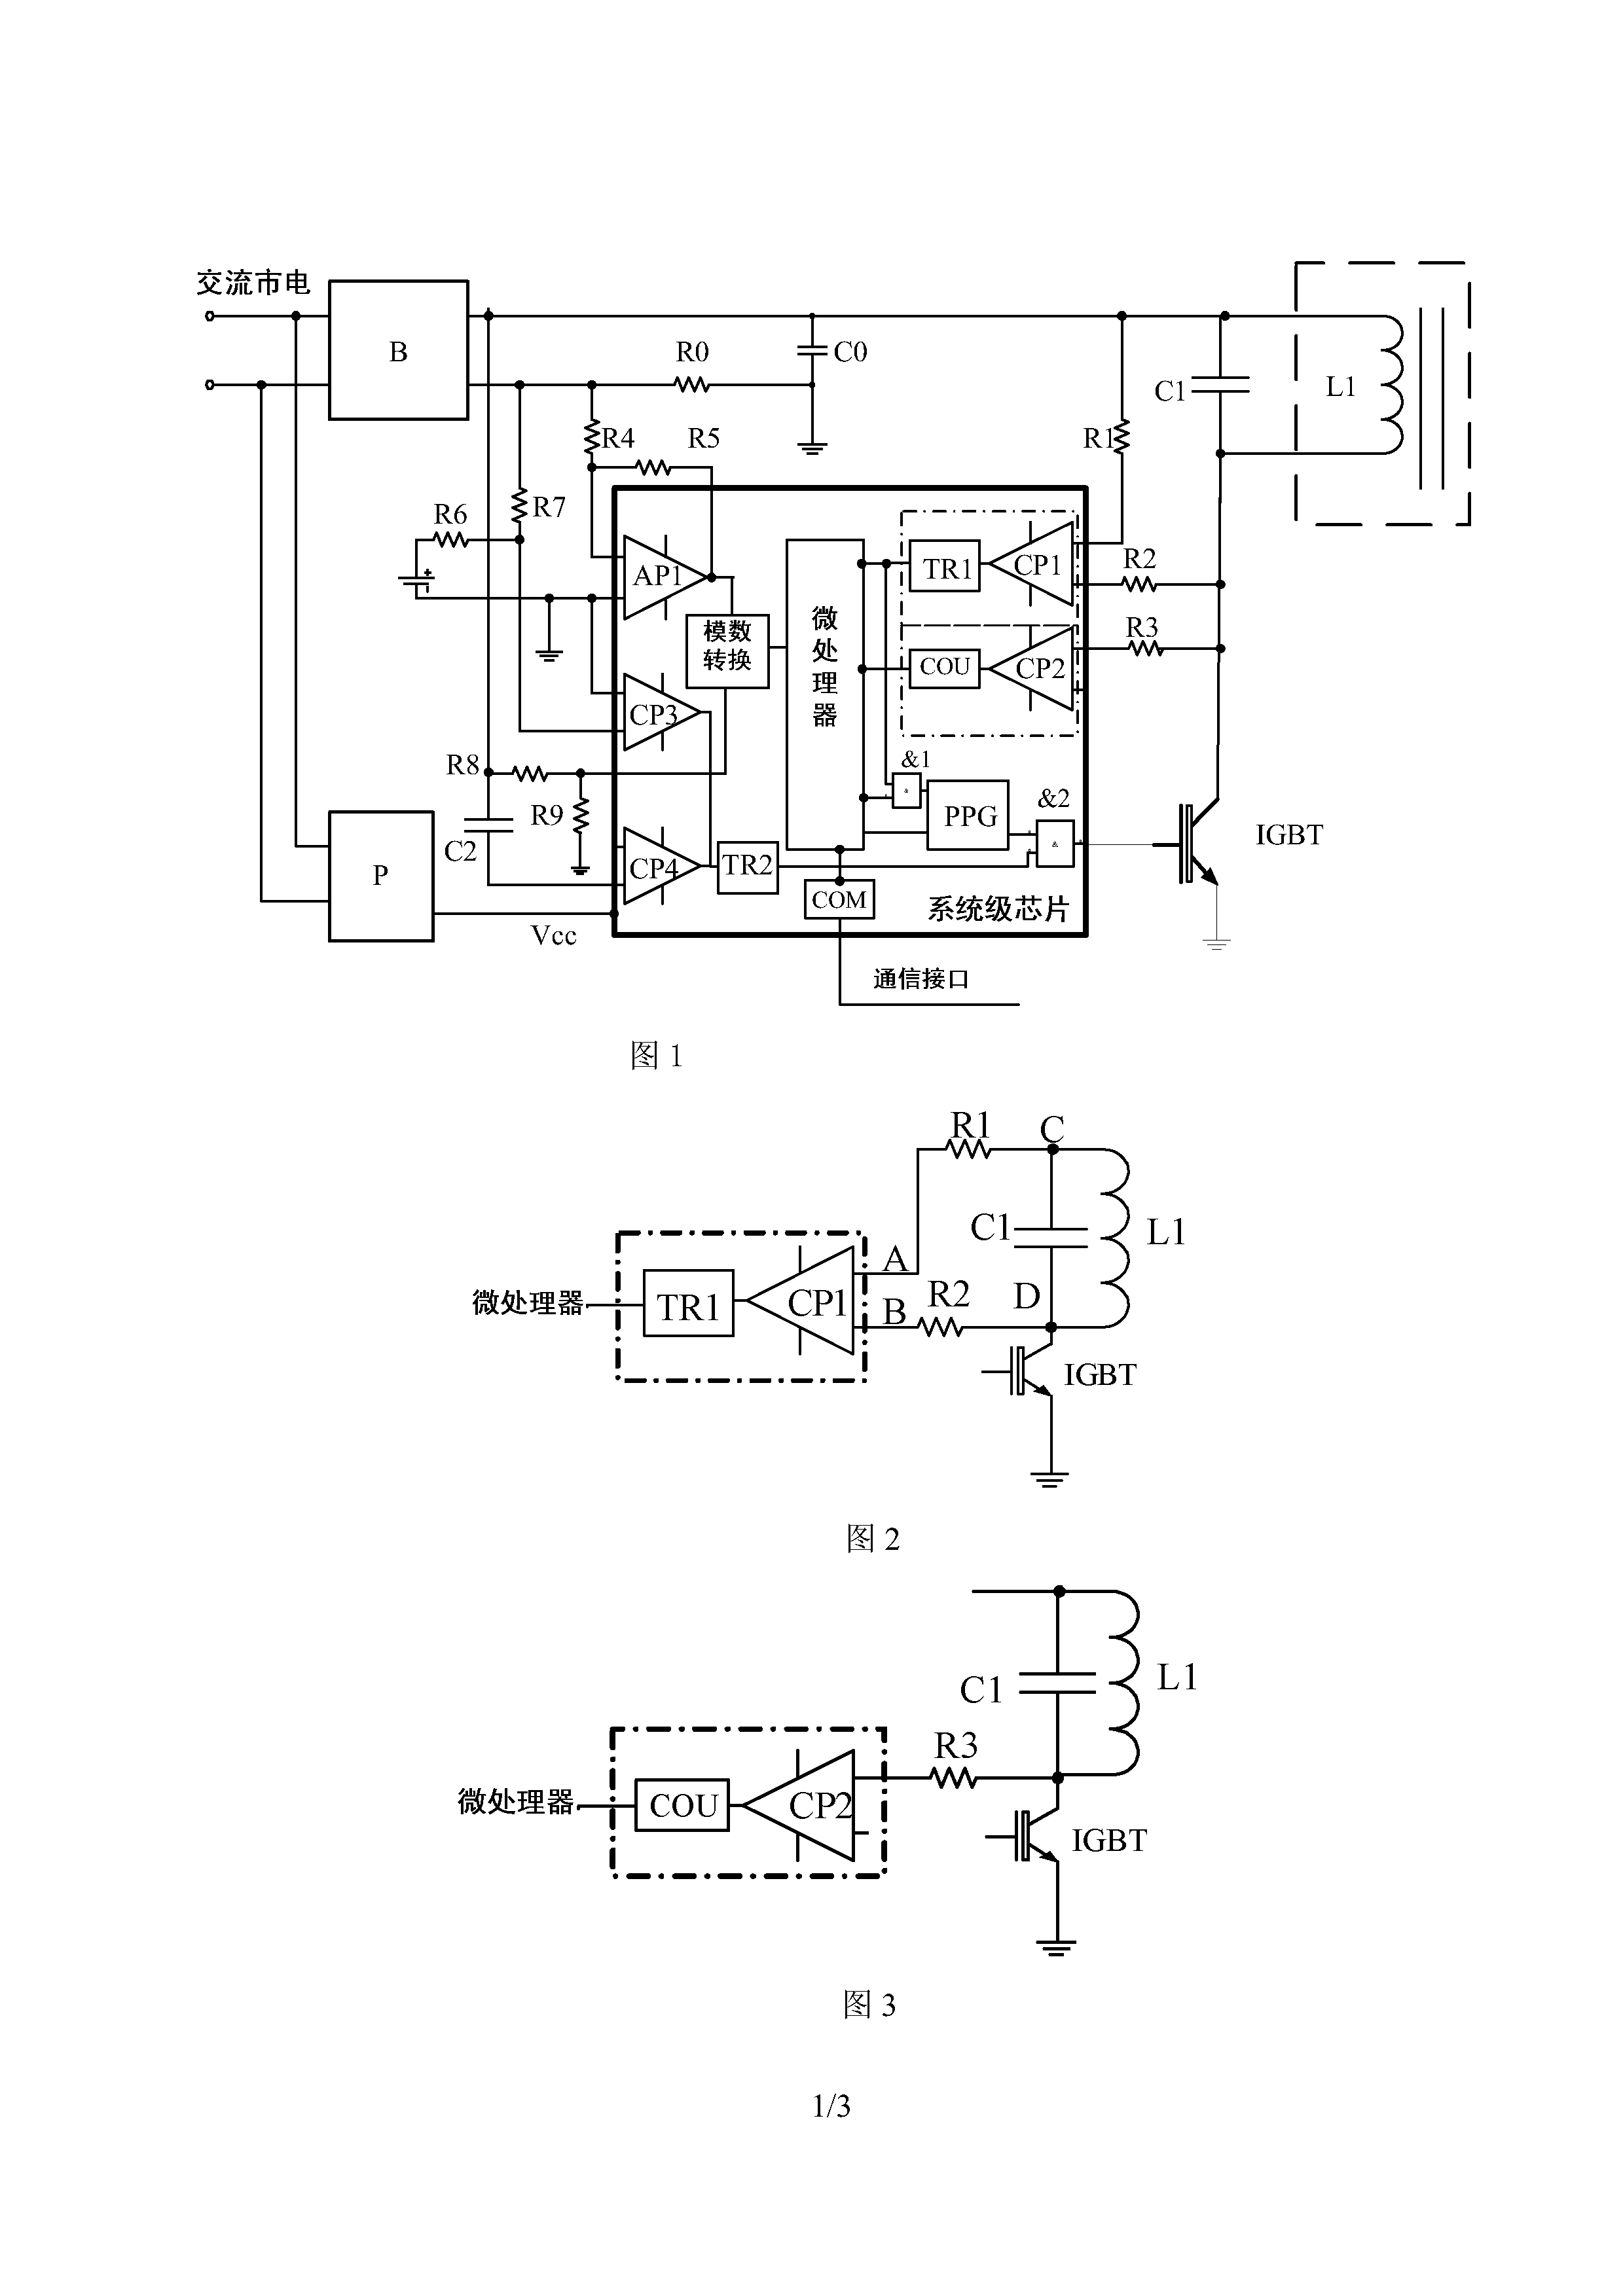 patent wo2011003301a1